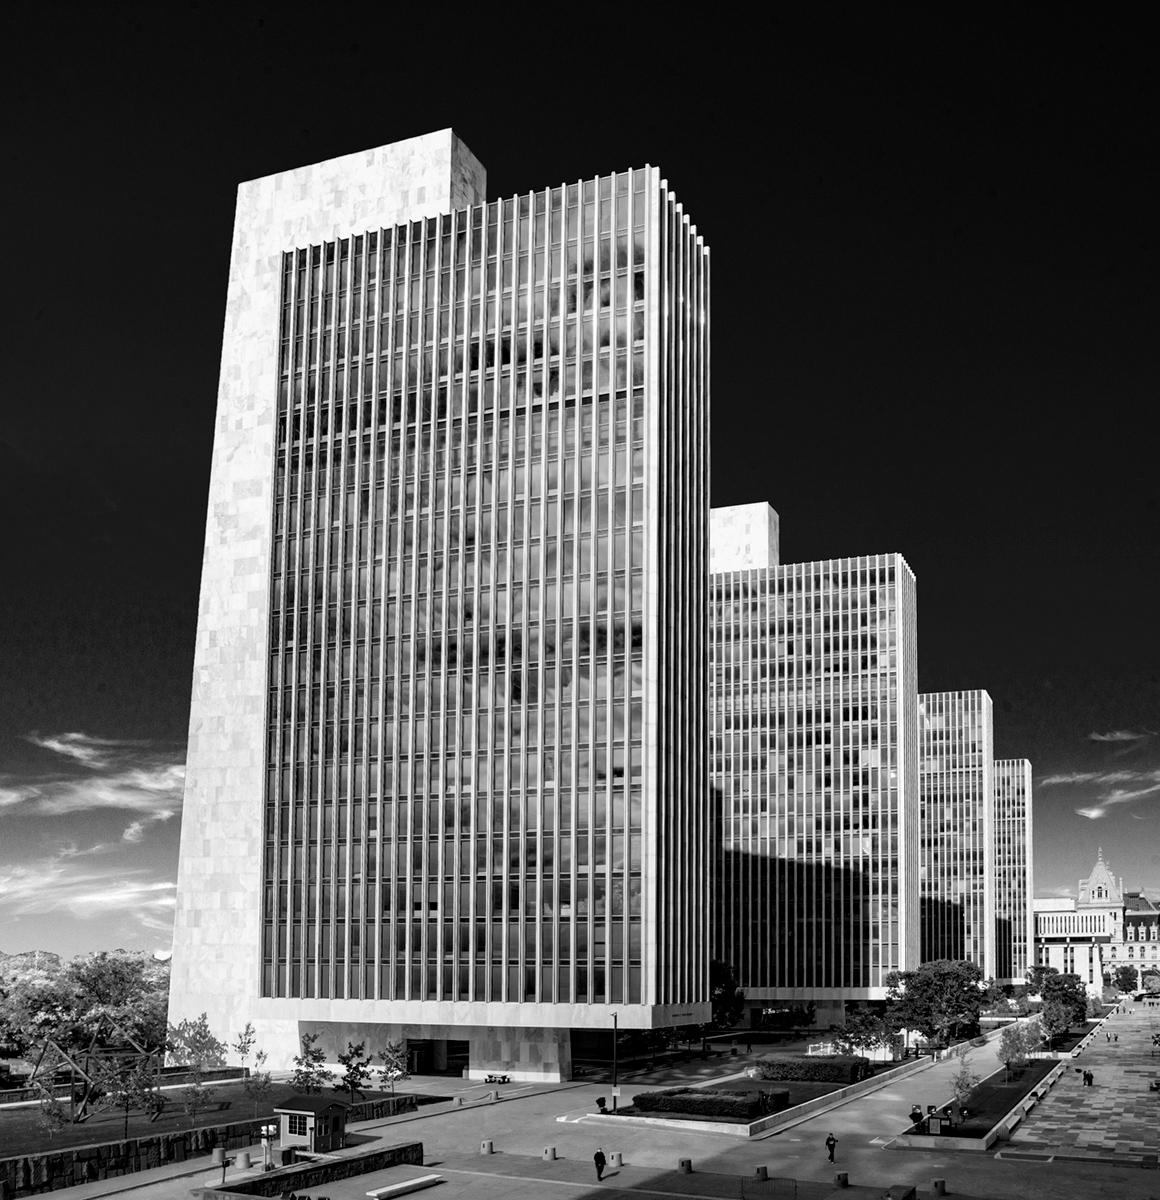 Empire Plaza Photographed by David Fonda